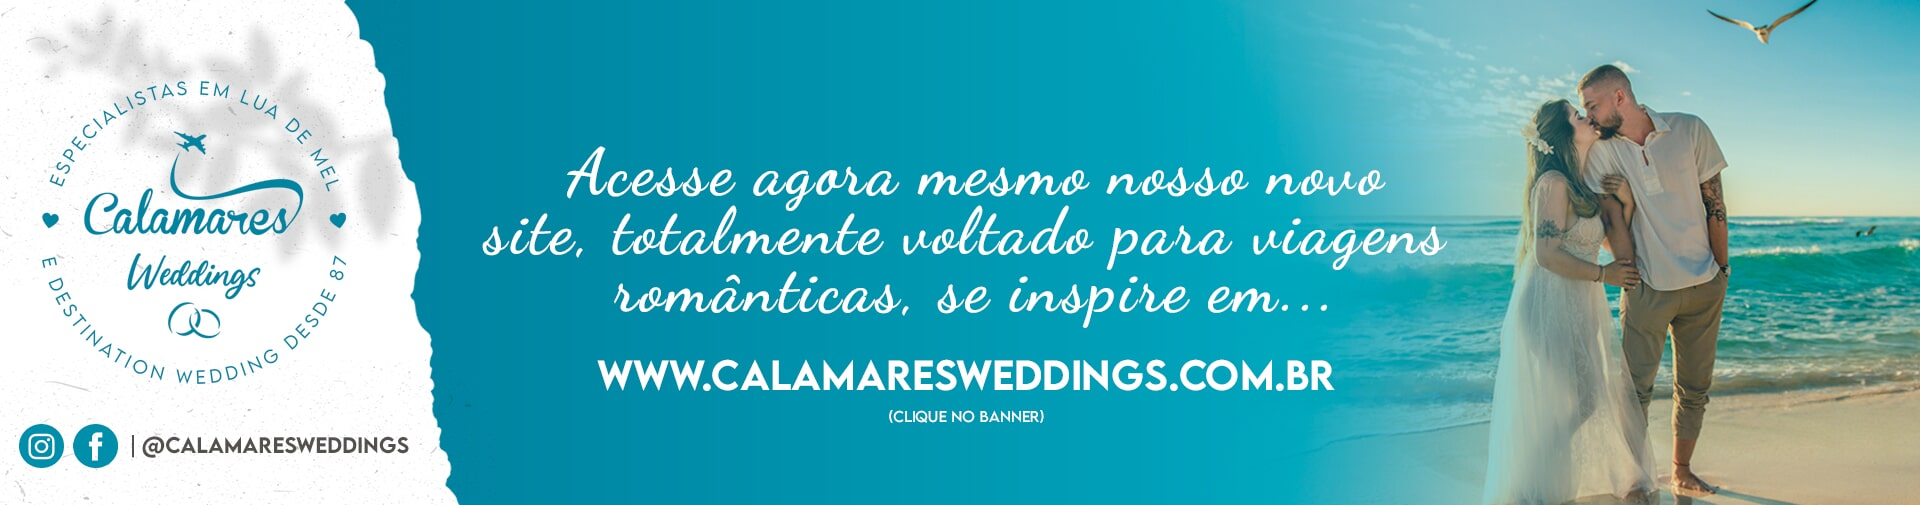 Acesse agora mesmo Calamares Weddings